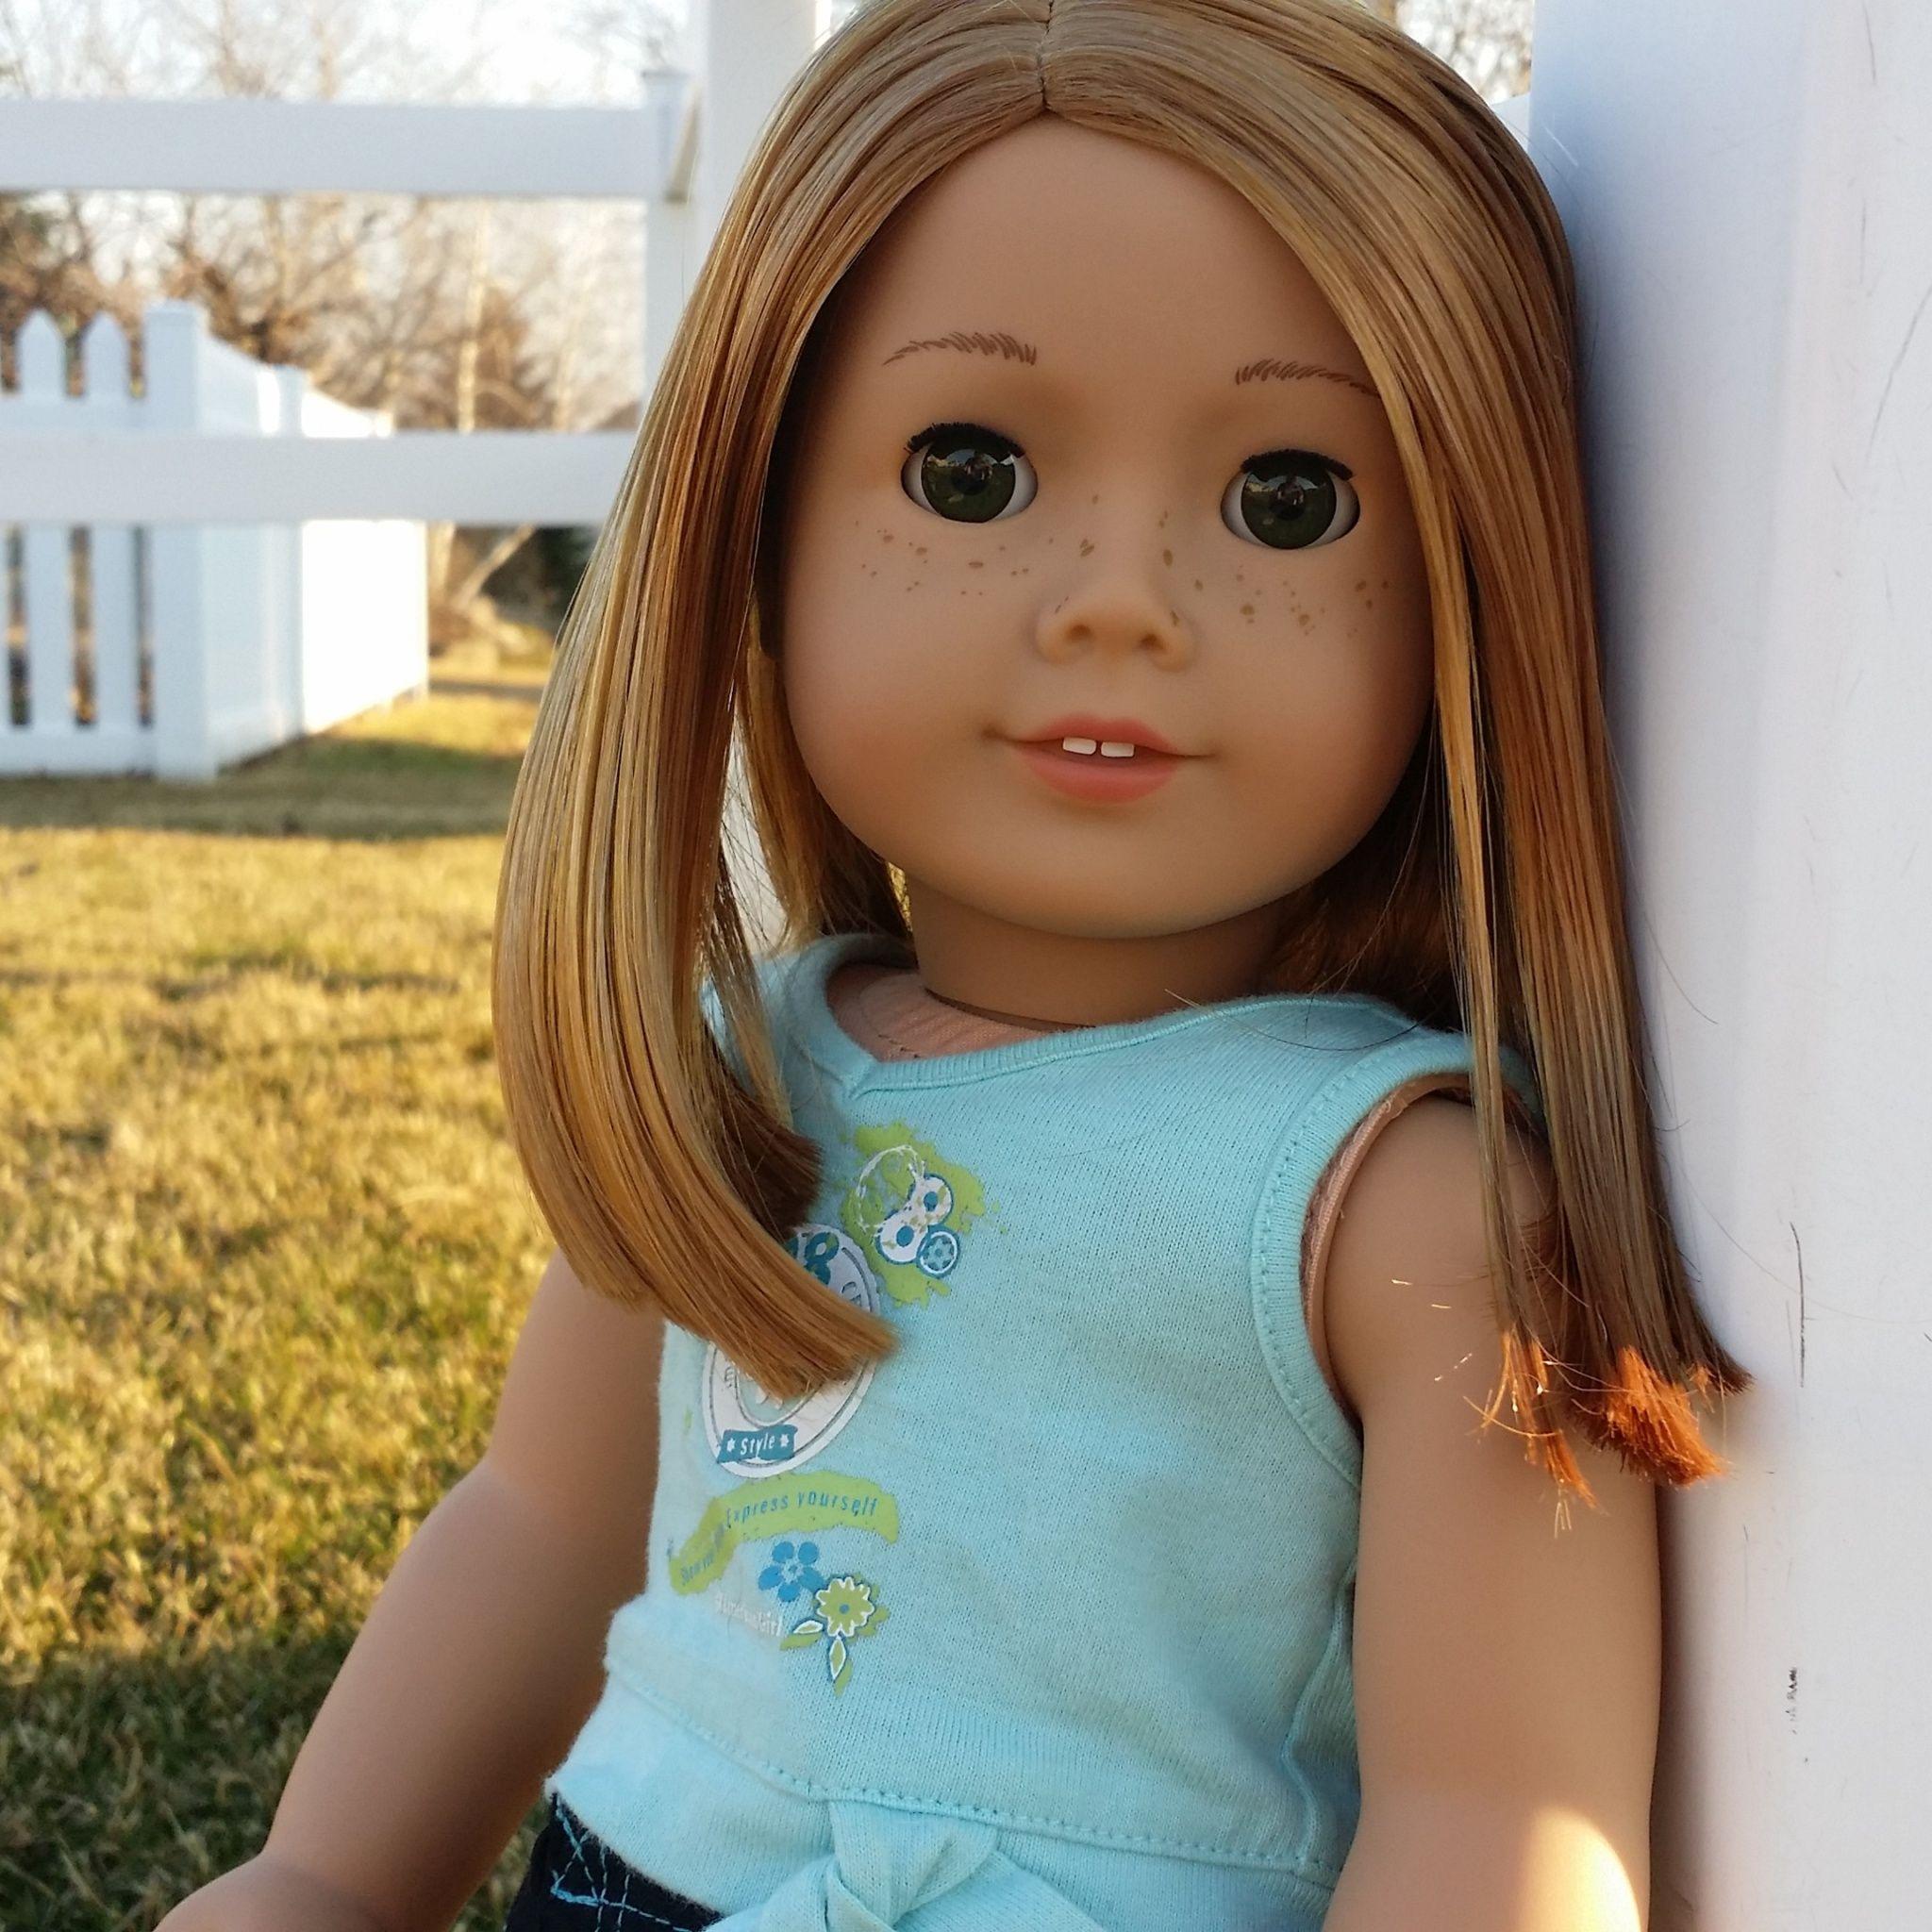 Red hair freckles green eyes